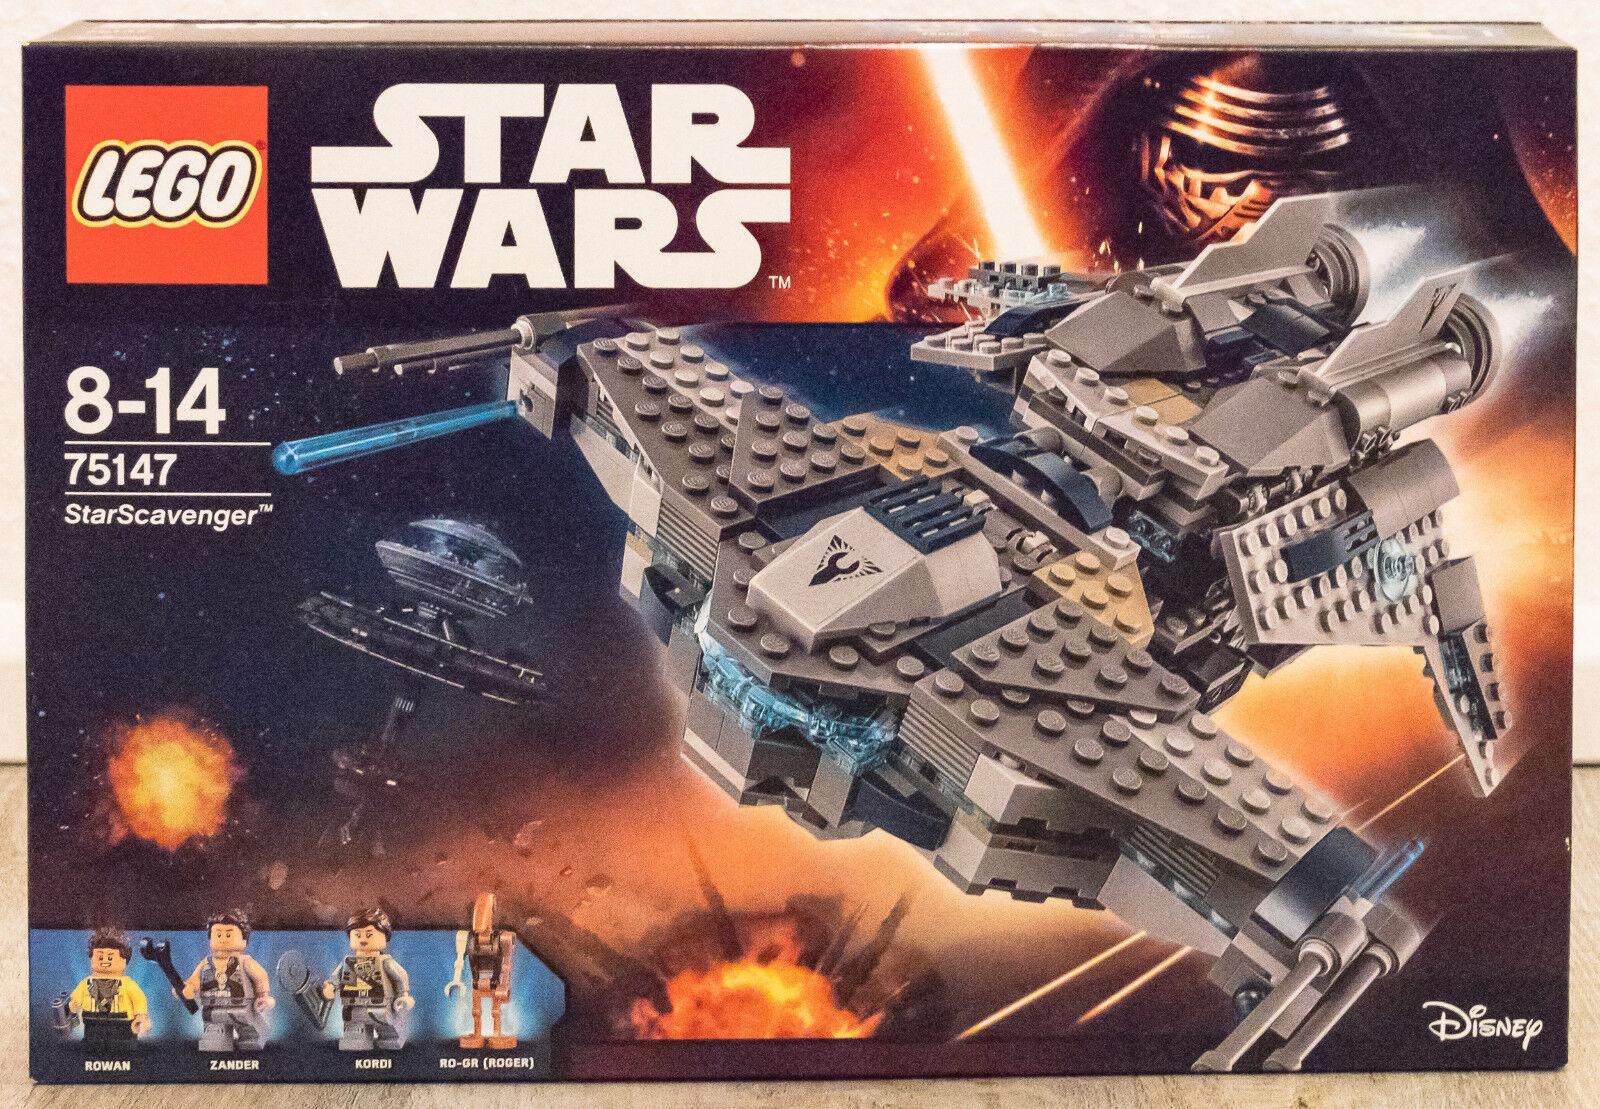 Lego ® Star Wars ™ 75147 starscavenger rar nuevo embalaje original New misb NRFB Sealed